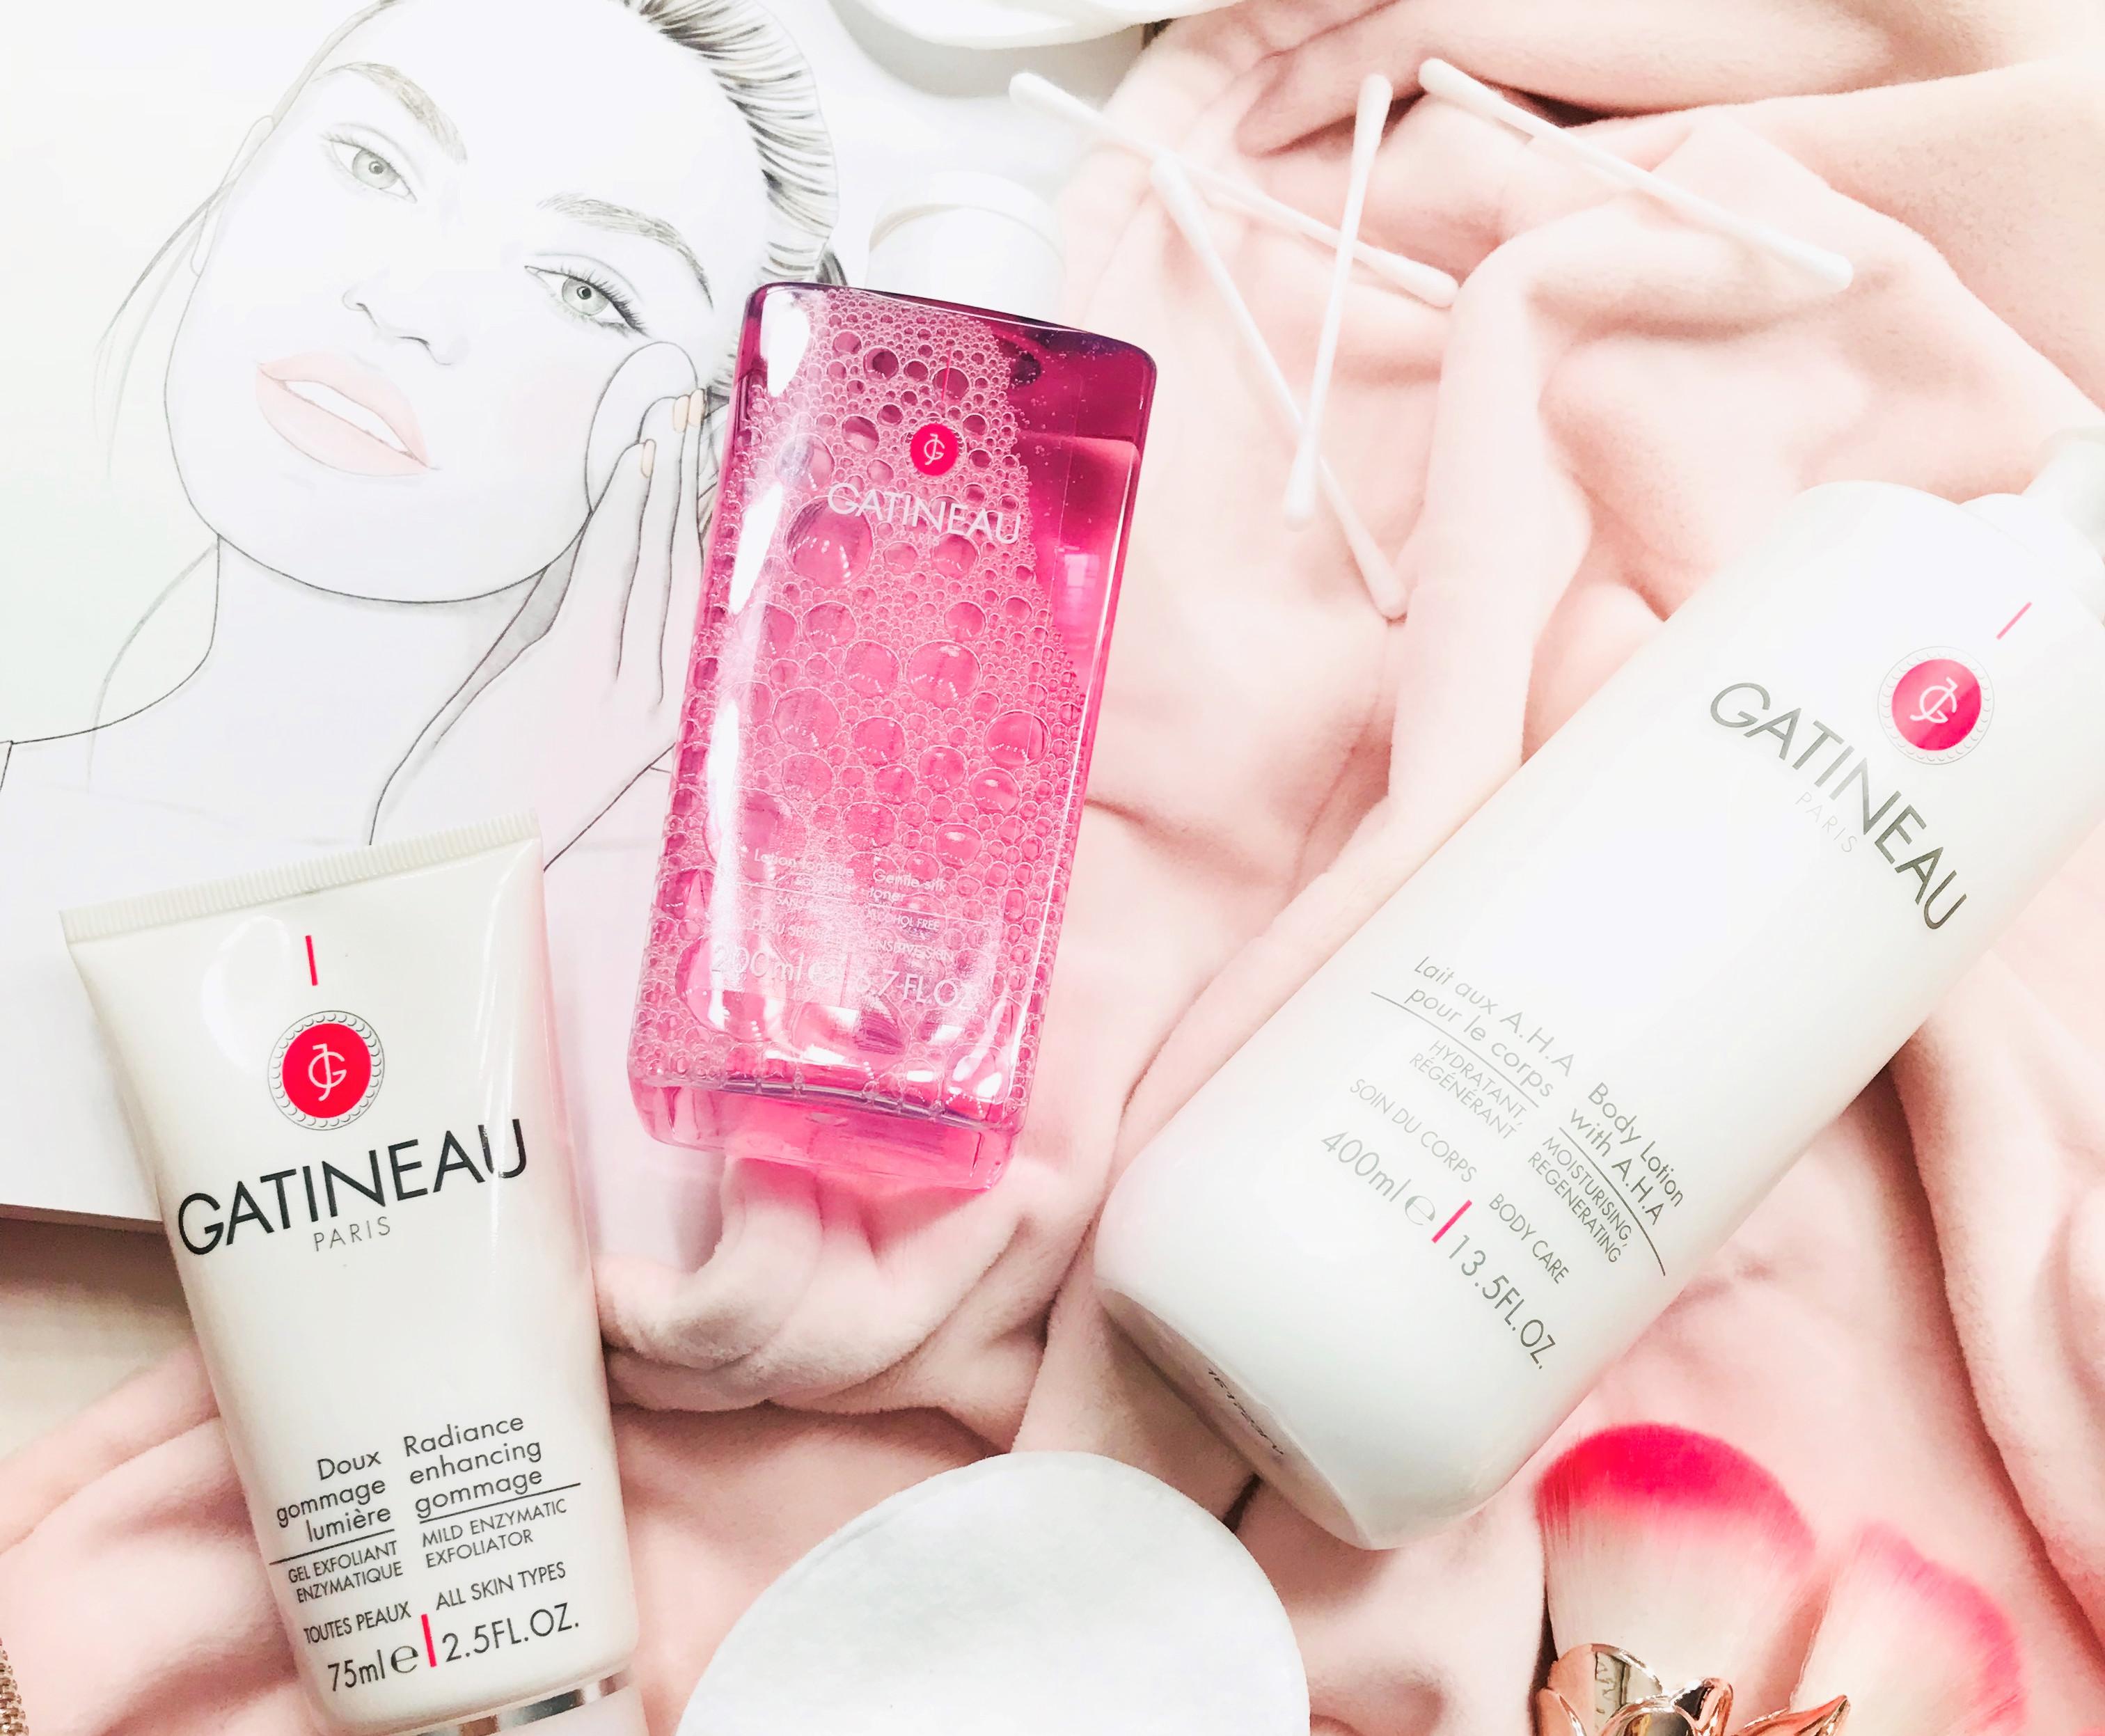 Discovering Gatineau Skincare